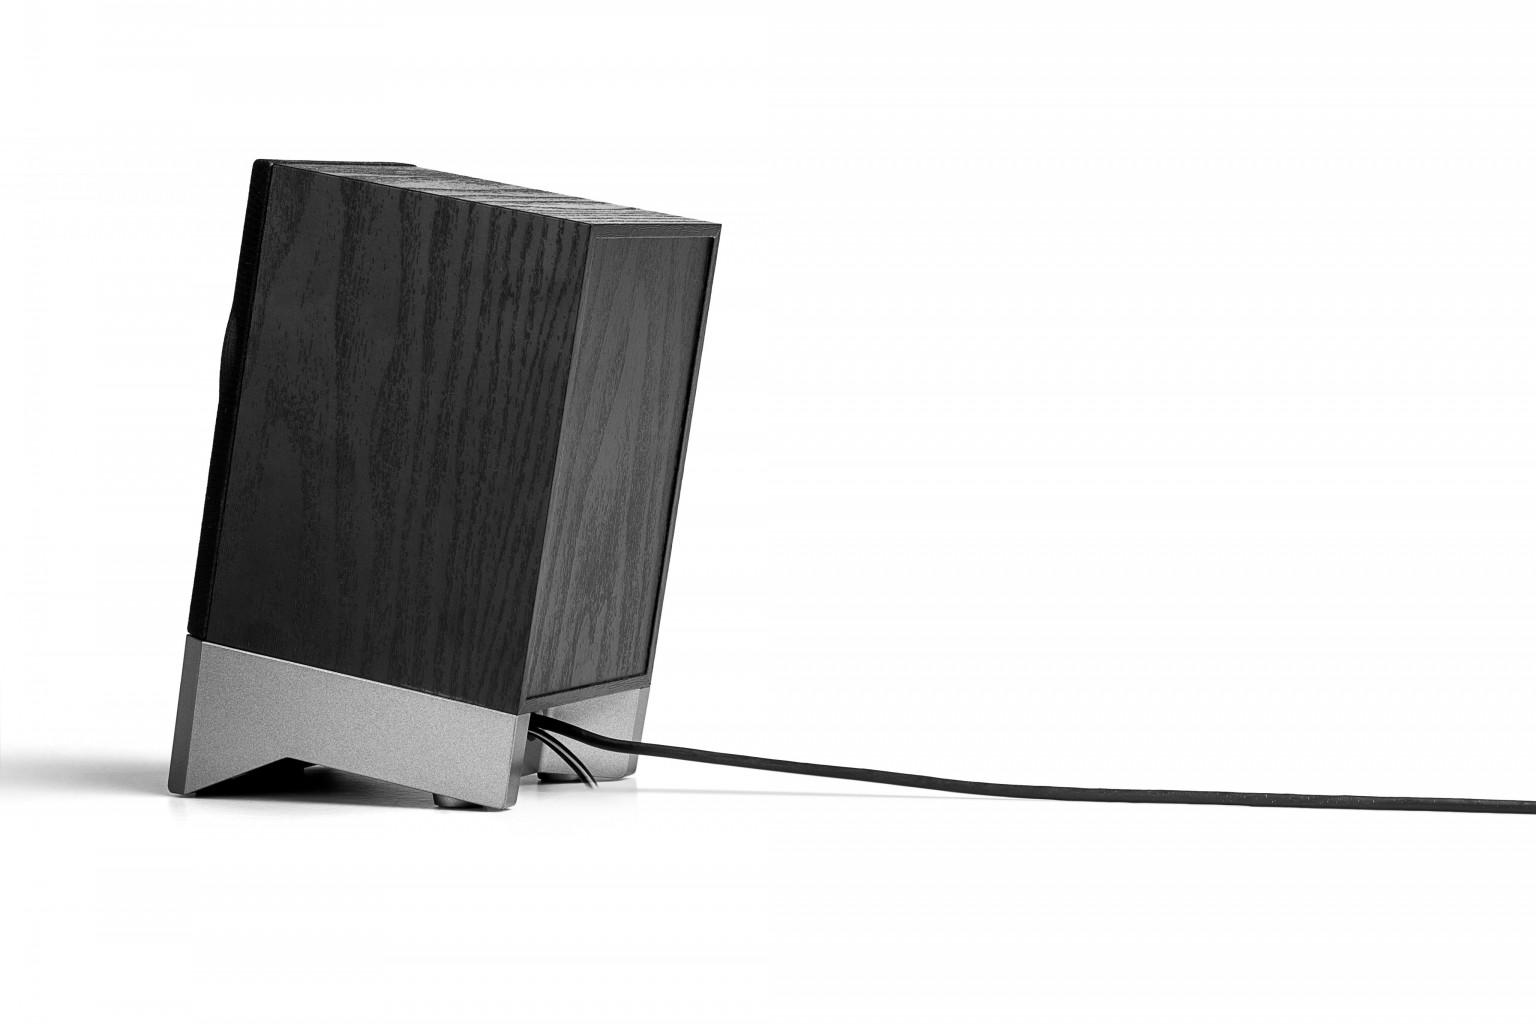 edifier speakers